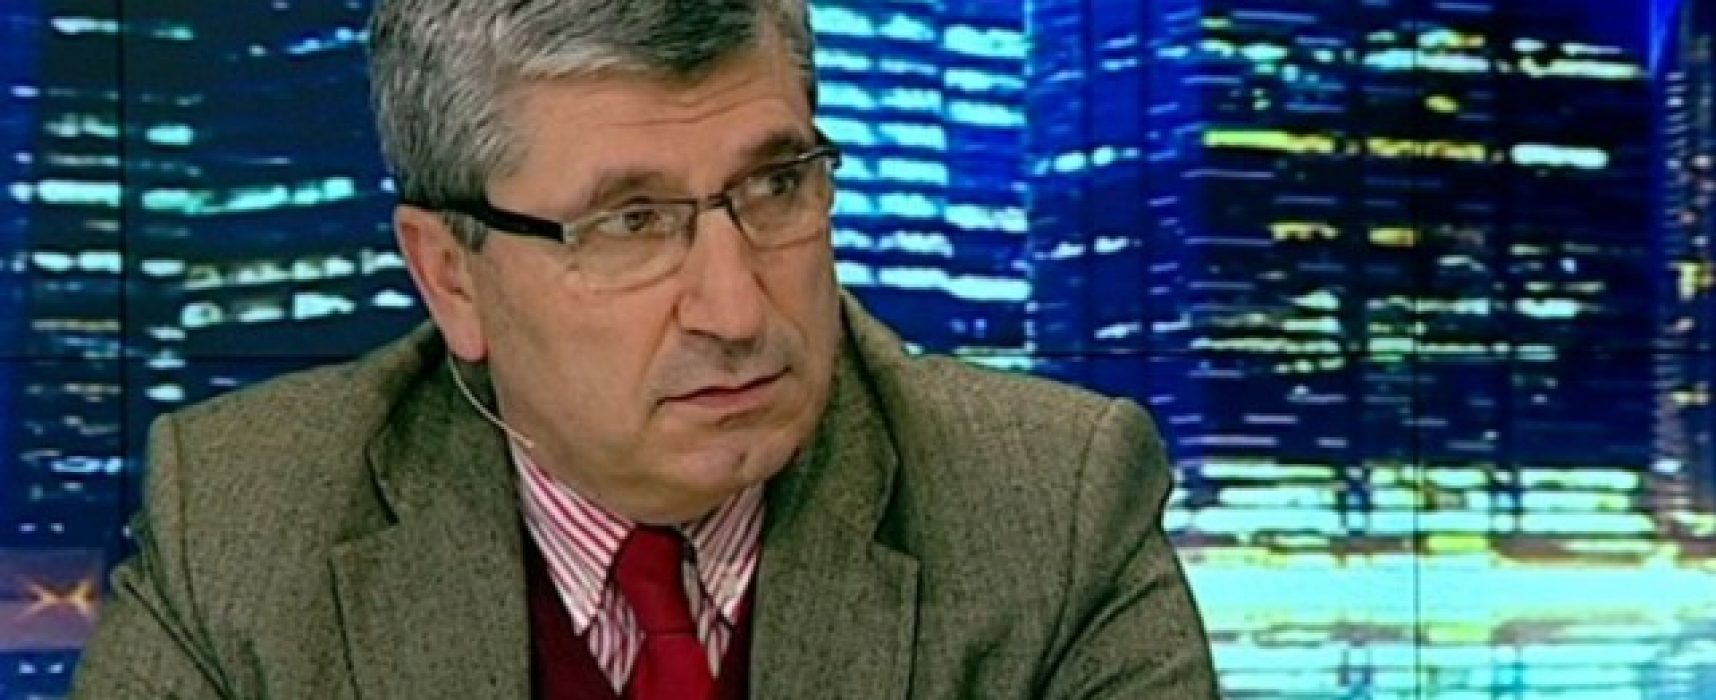 Илиян Василев: При нас има по-благодатна приемна среда за дейност на руските служби